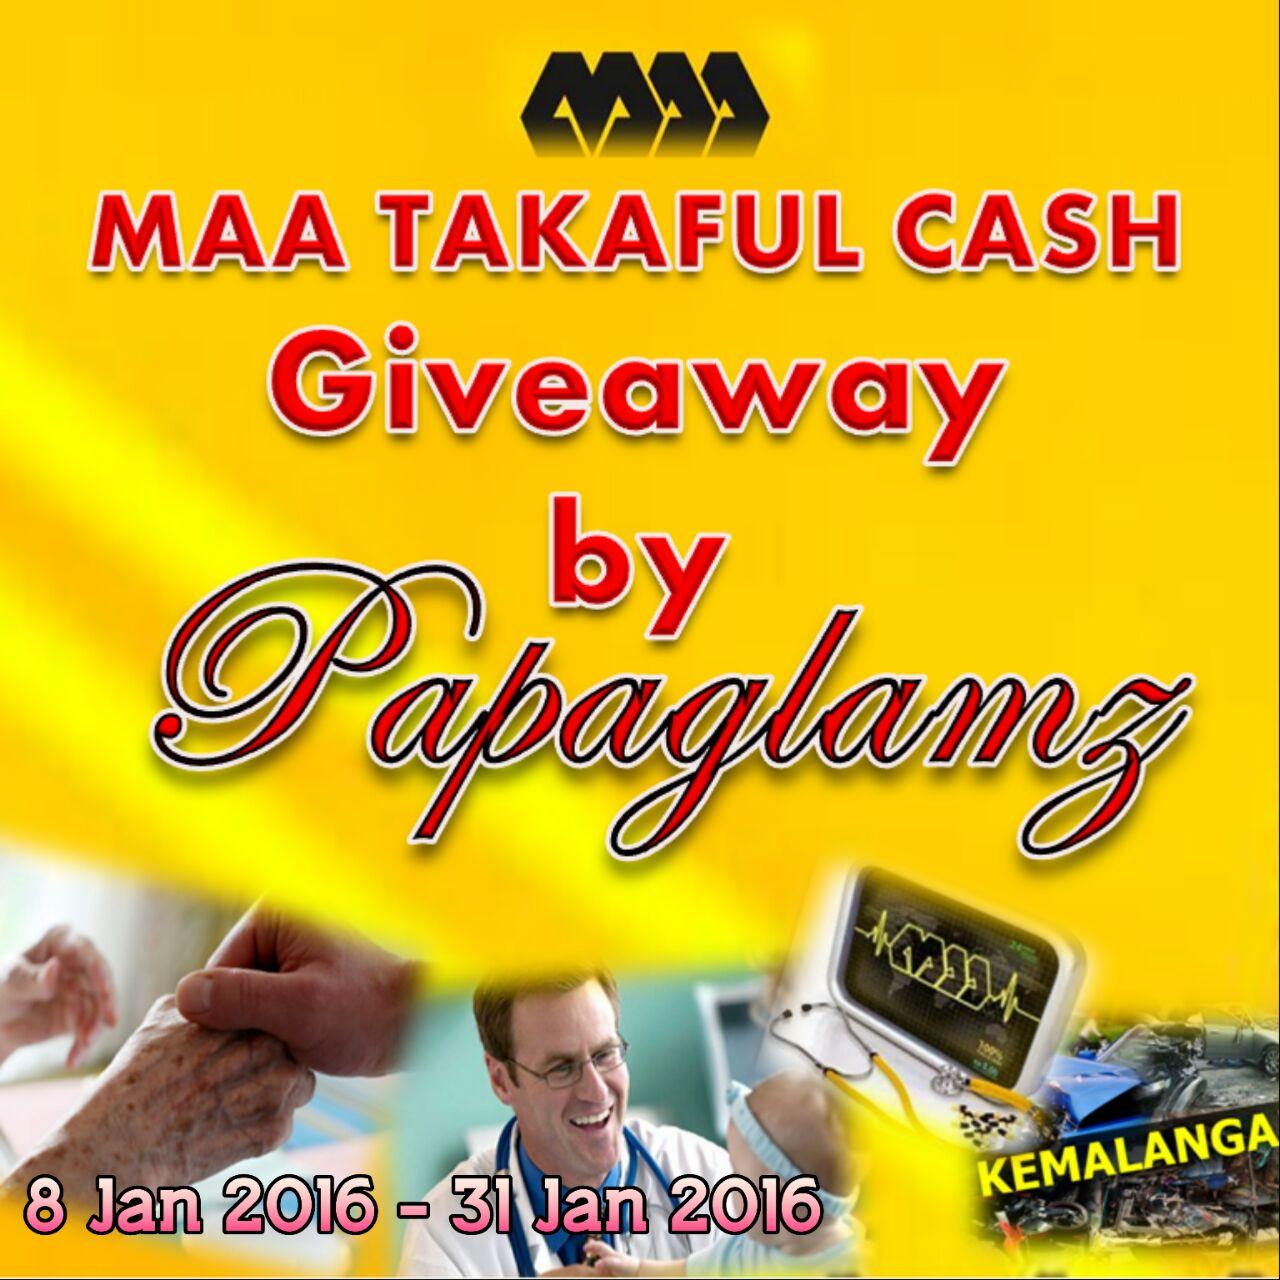 MAA TAKAFUL CASH GIVEAWAY by Papaglamz